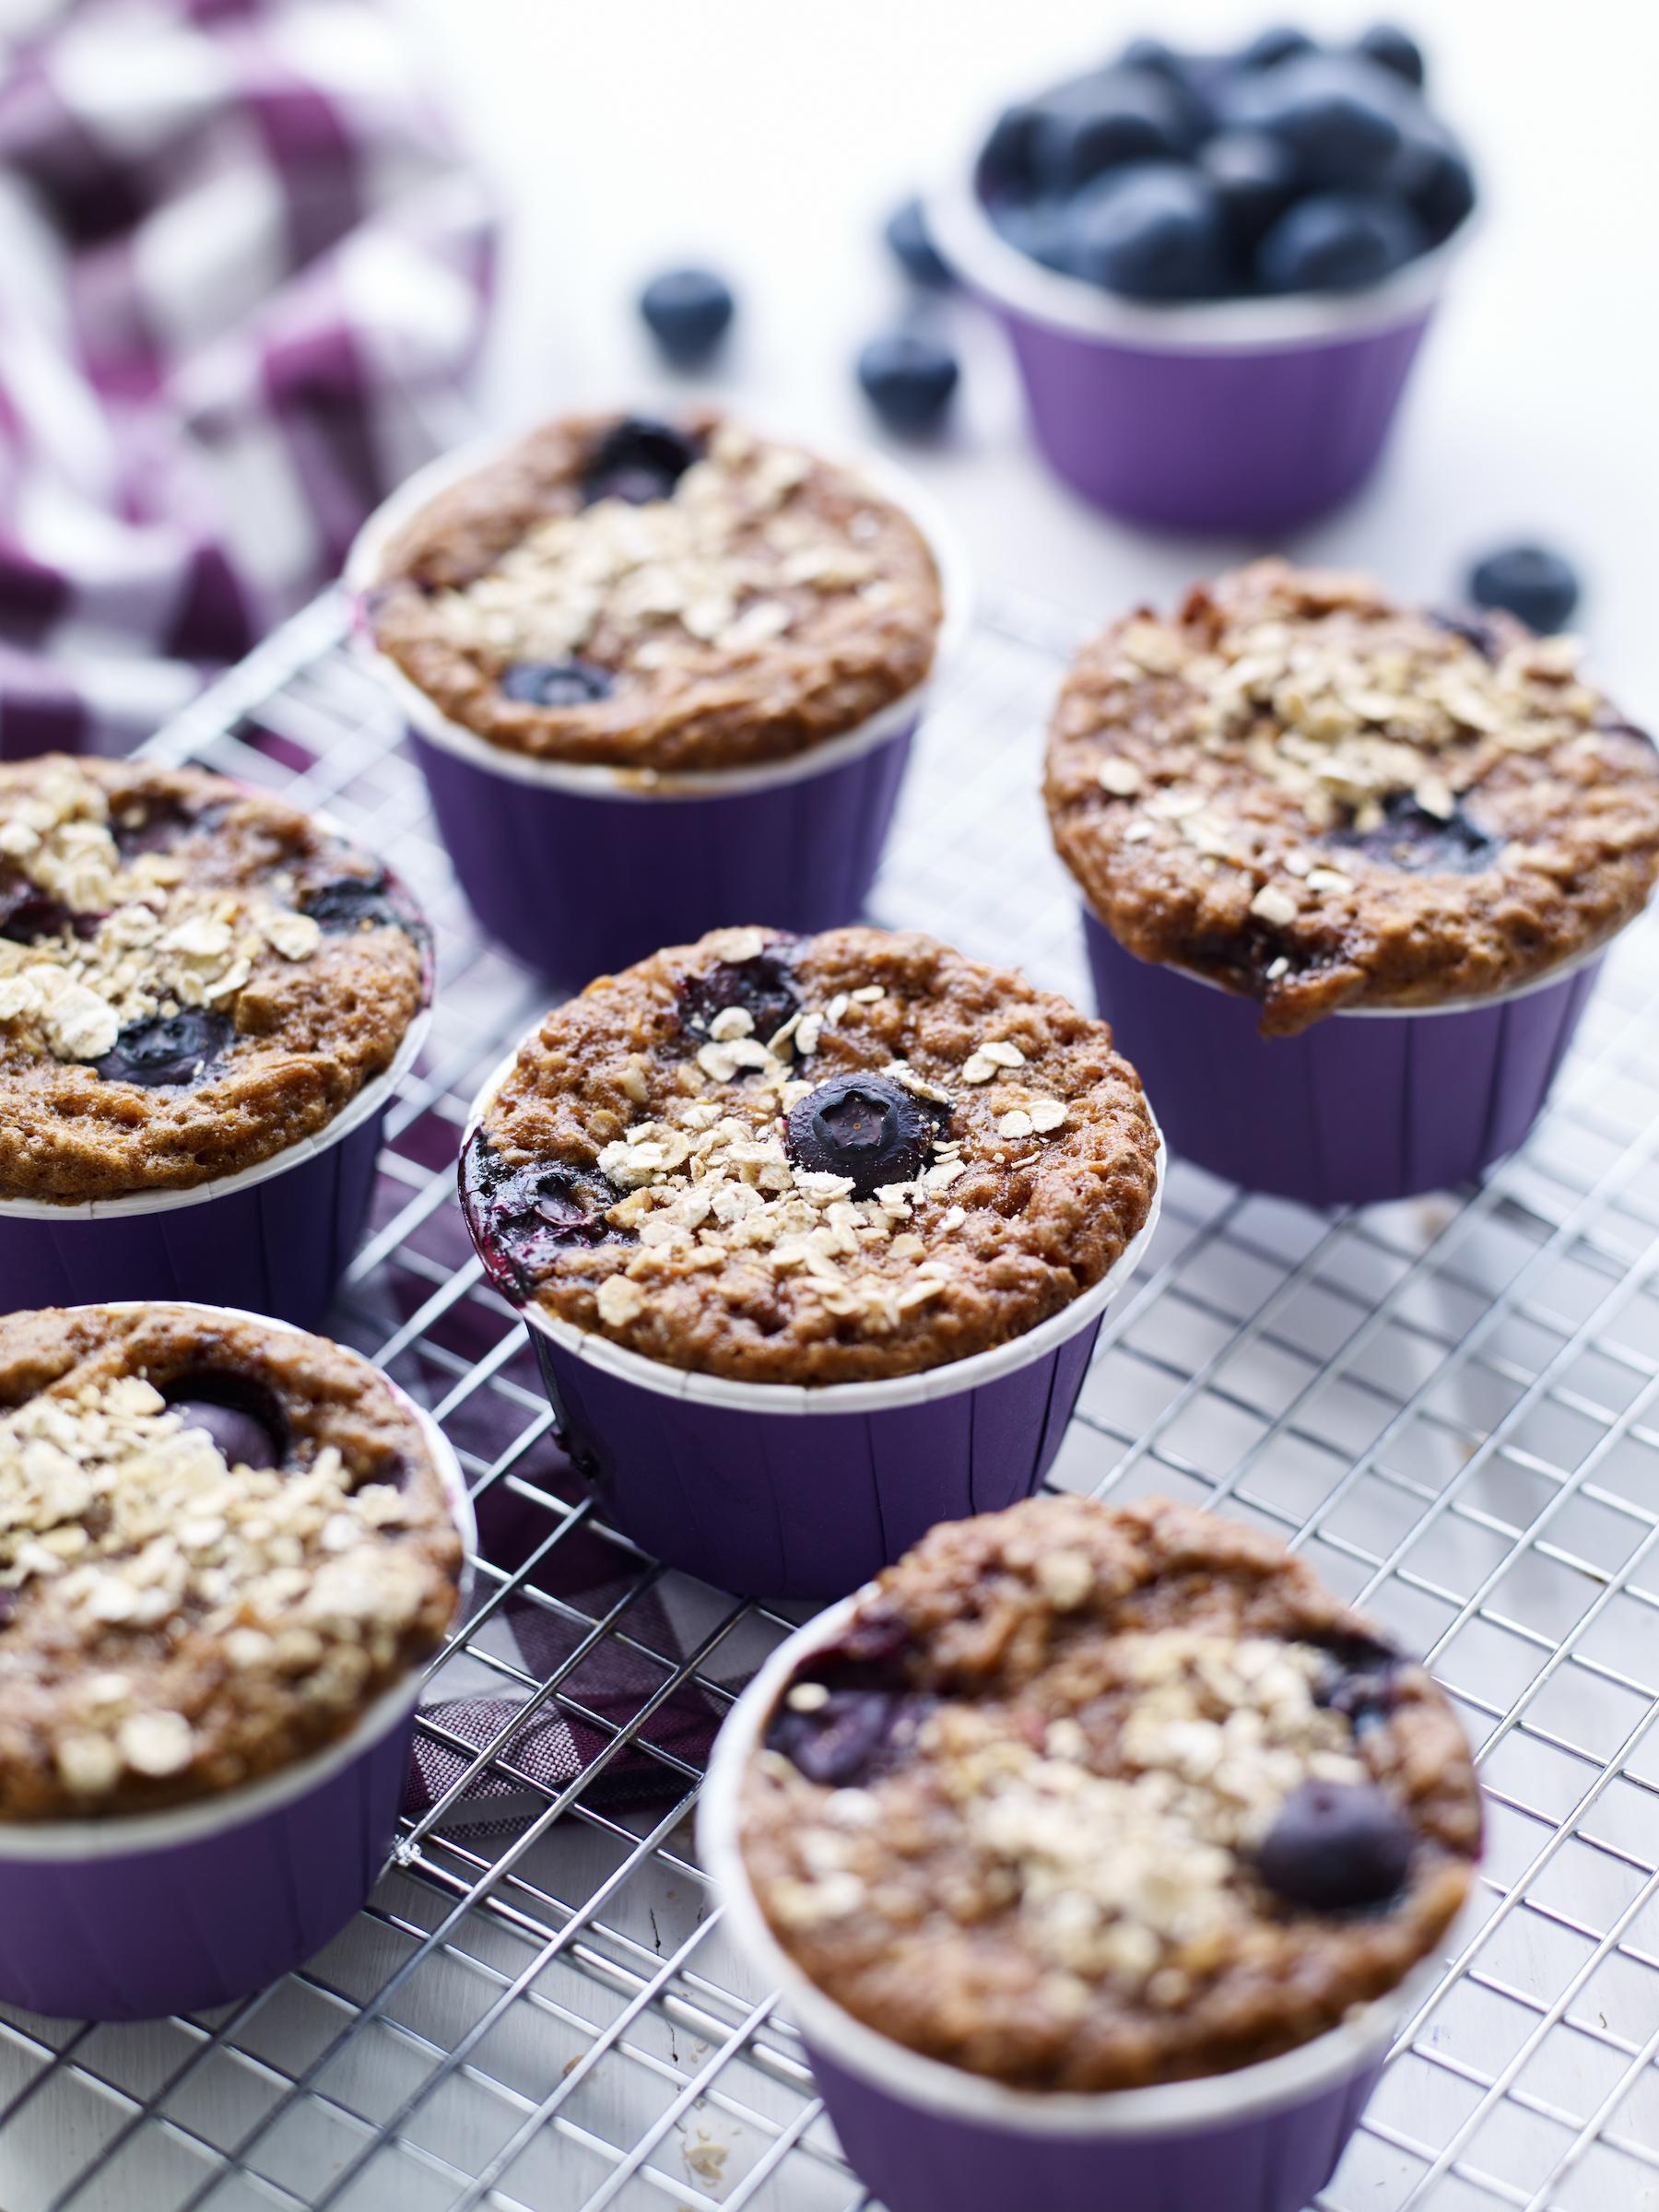 Berry World Health Chia and Blueberry Muffins 75iujk795